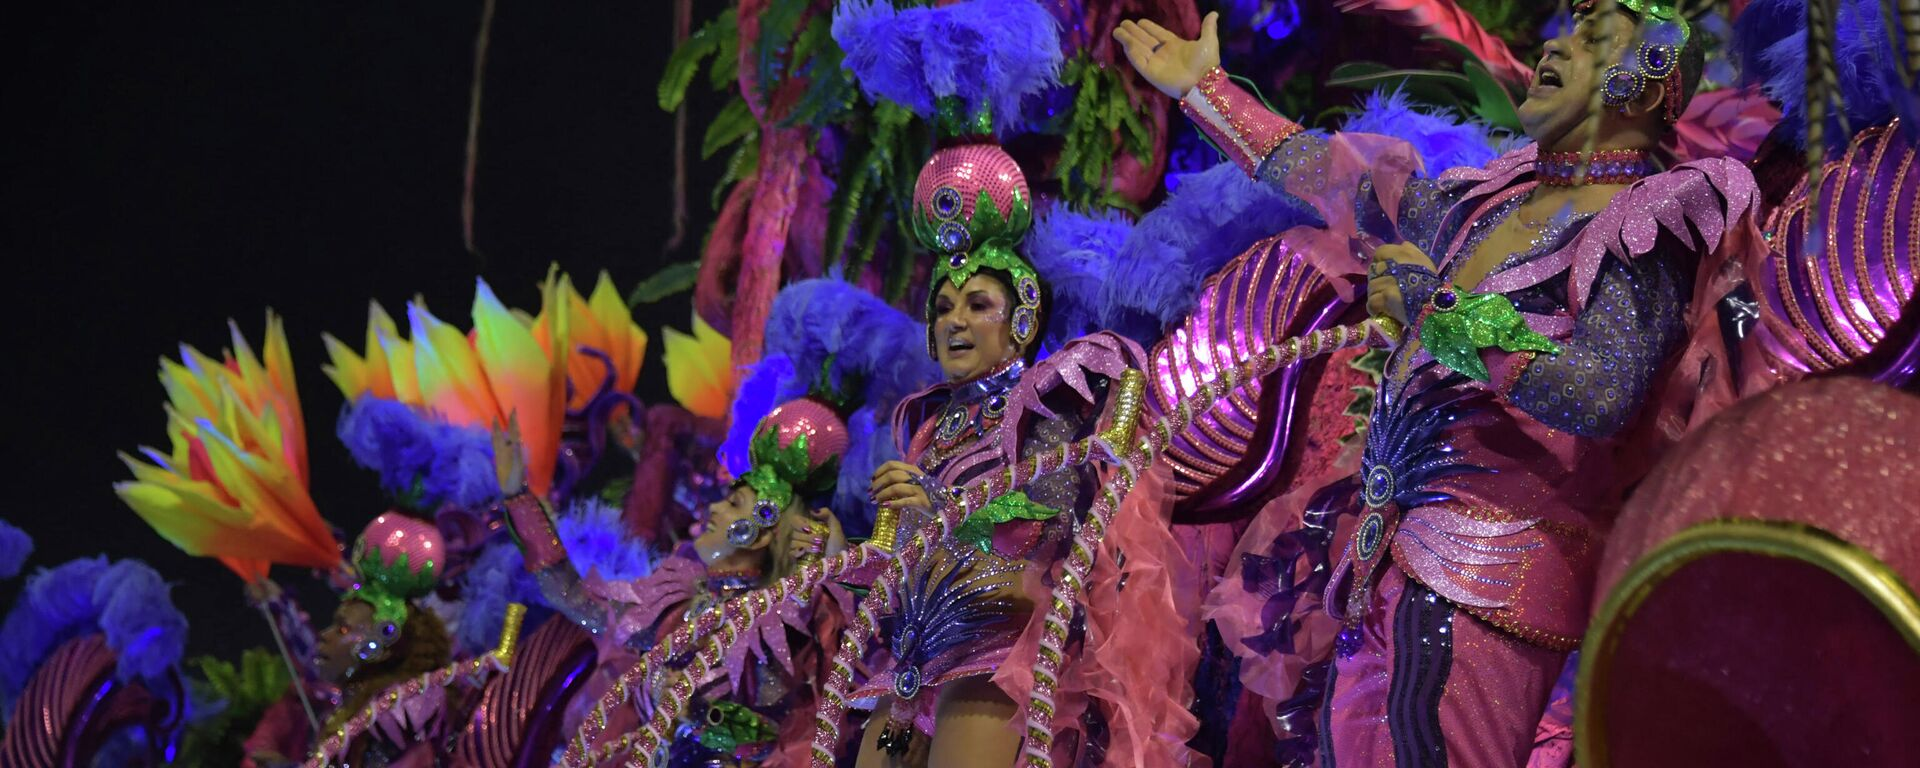 Carnaval en Sao Paulo, Brasil - Sputnik Mundo, 1920, 01.07.2021